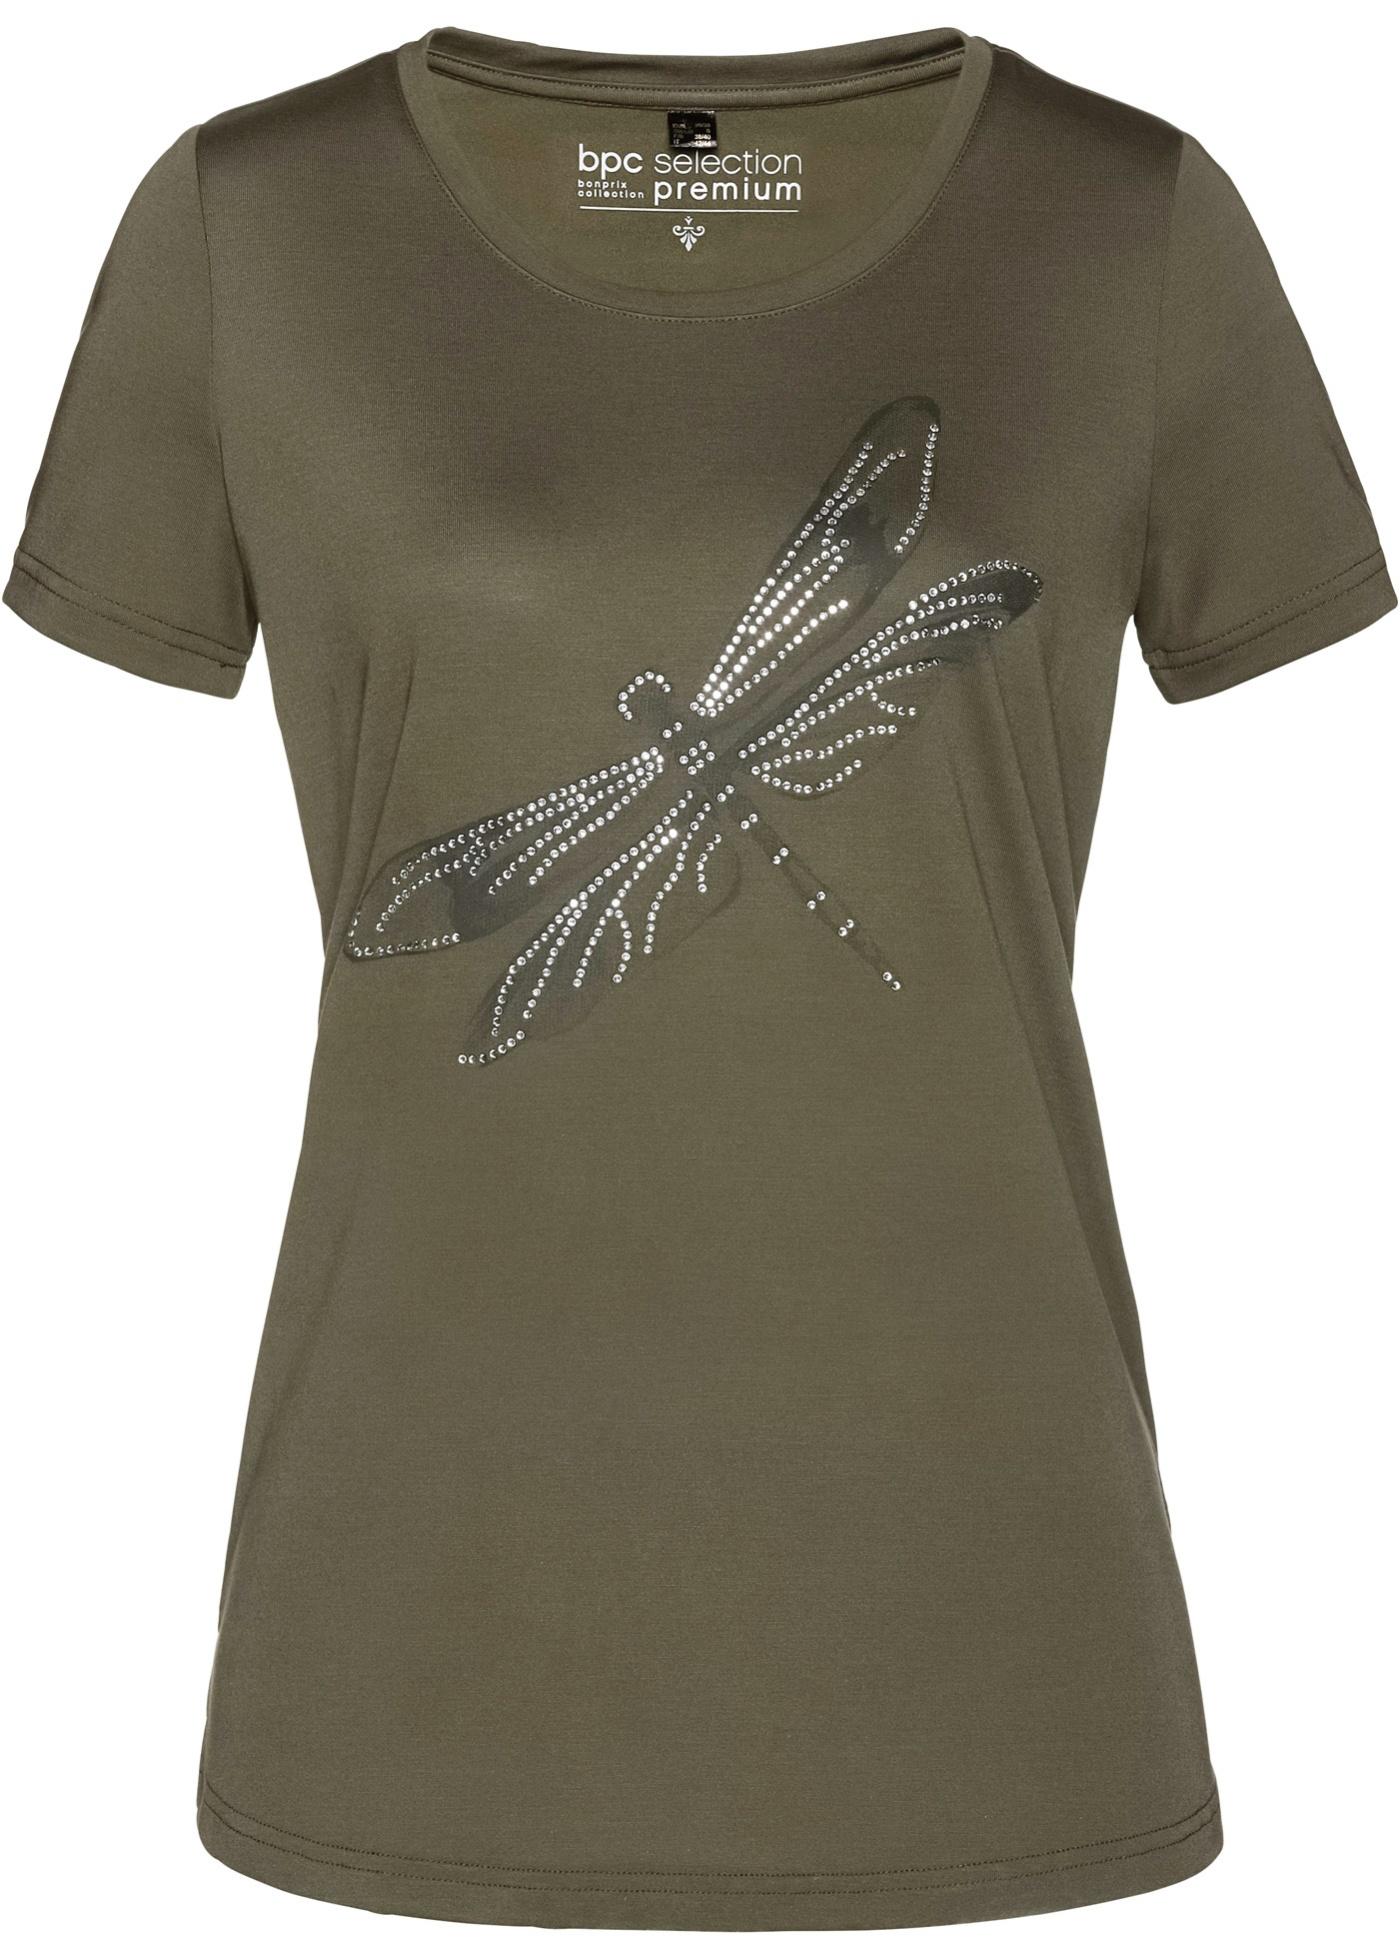 Courtes Vert Selection En Bpc Manches Premium Modal BonprixT Femme shirt Pour w0kO8nP